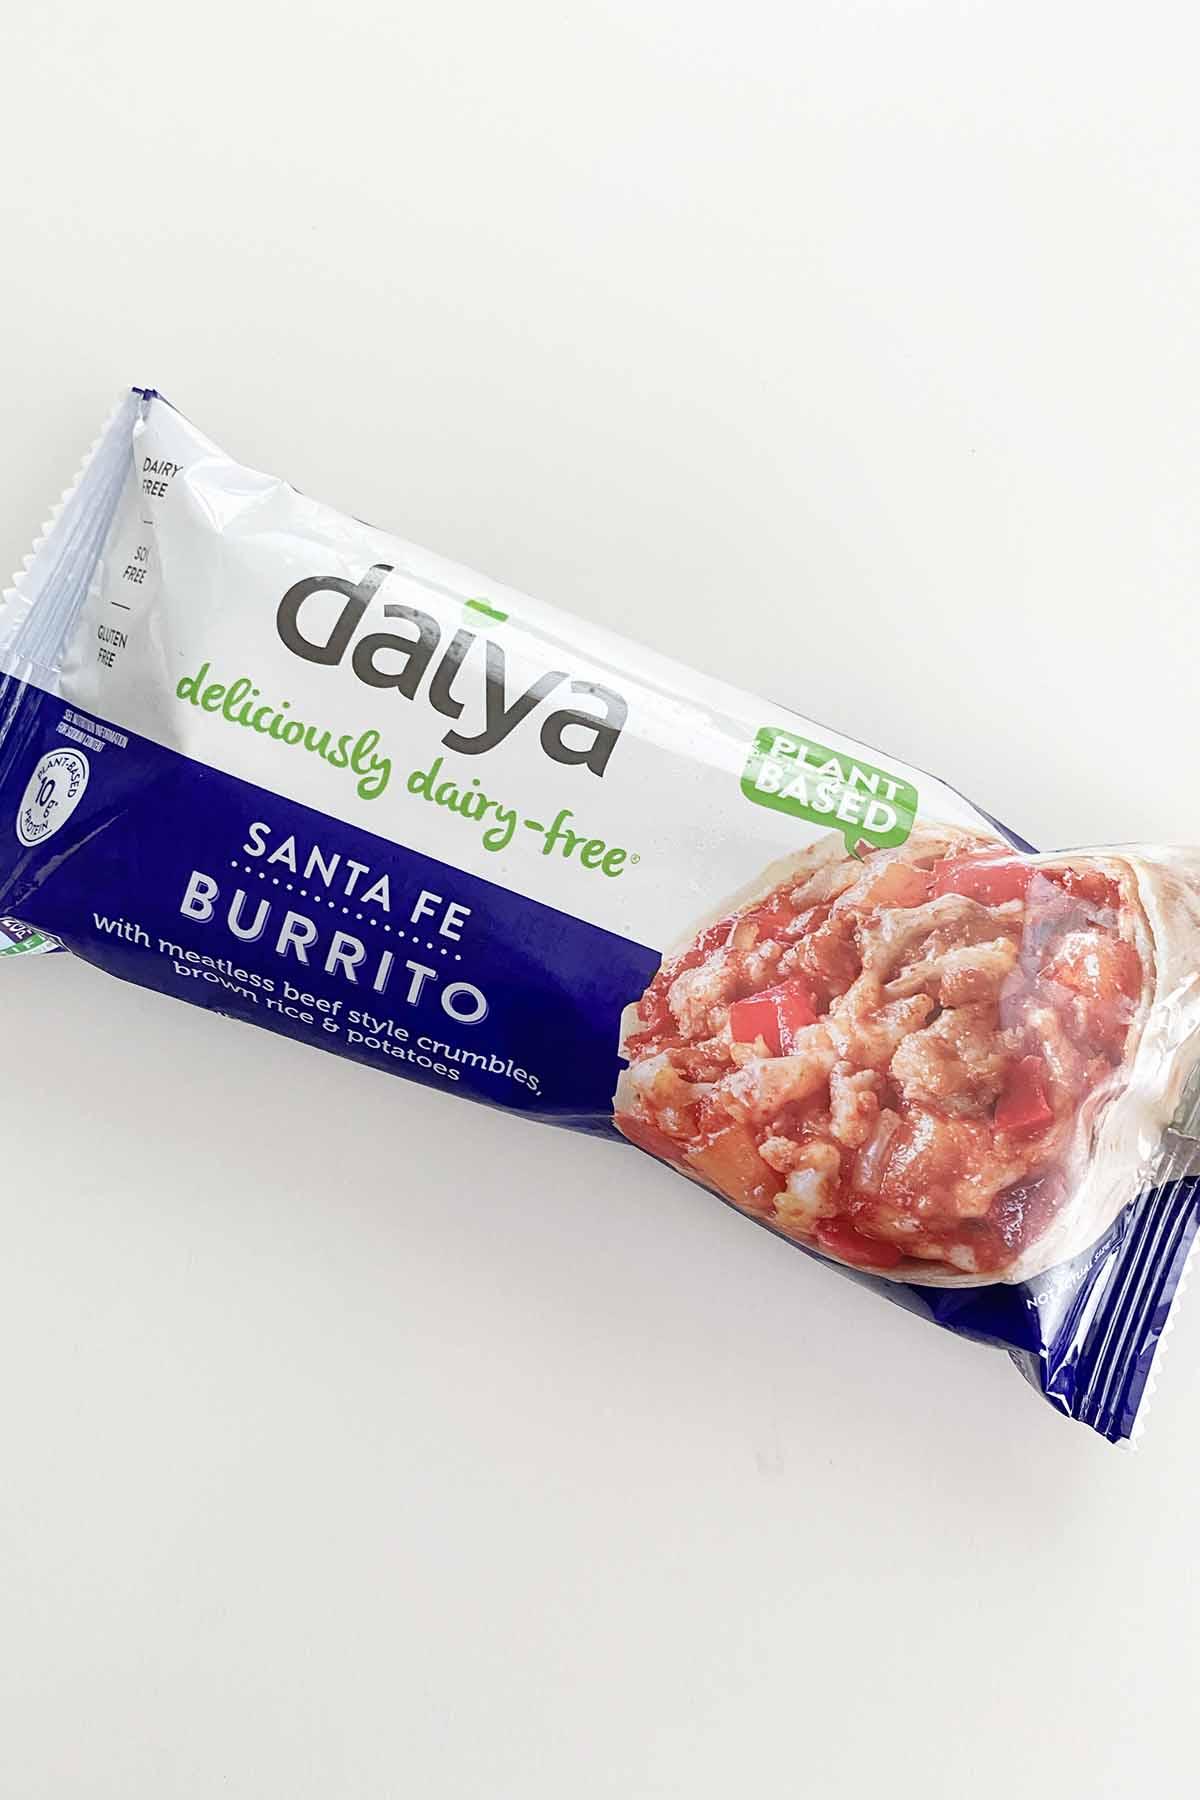 Daiya Santa Fe Burrito in the wrapper on a white table